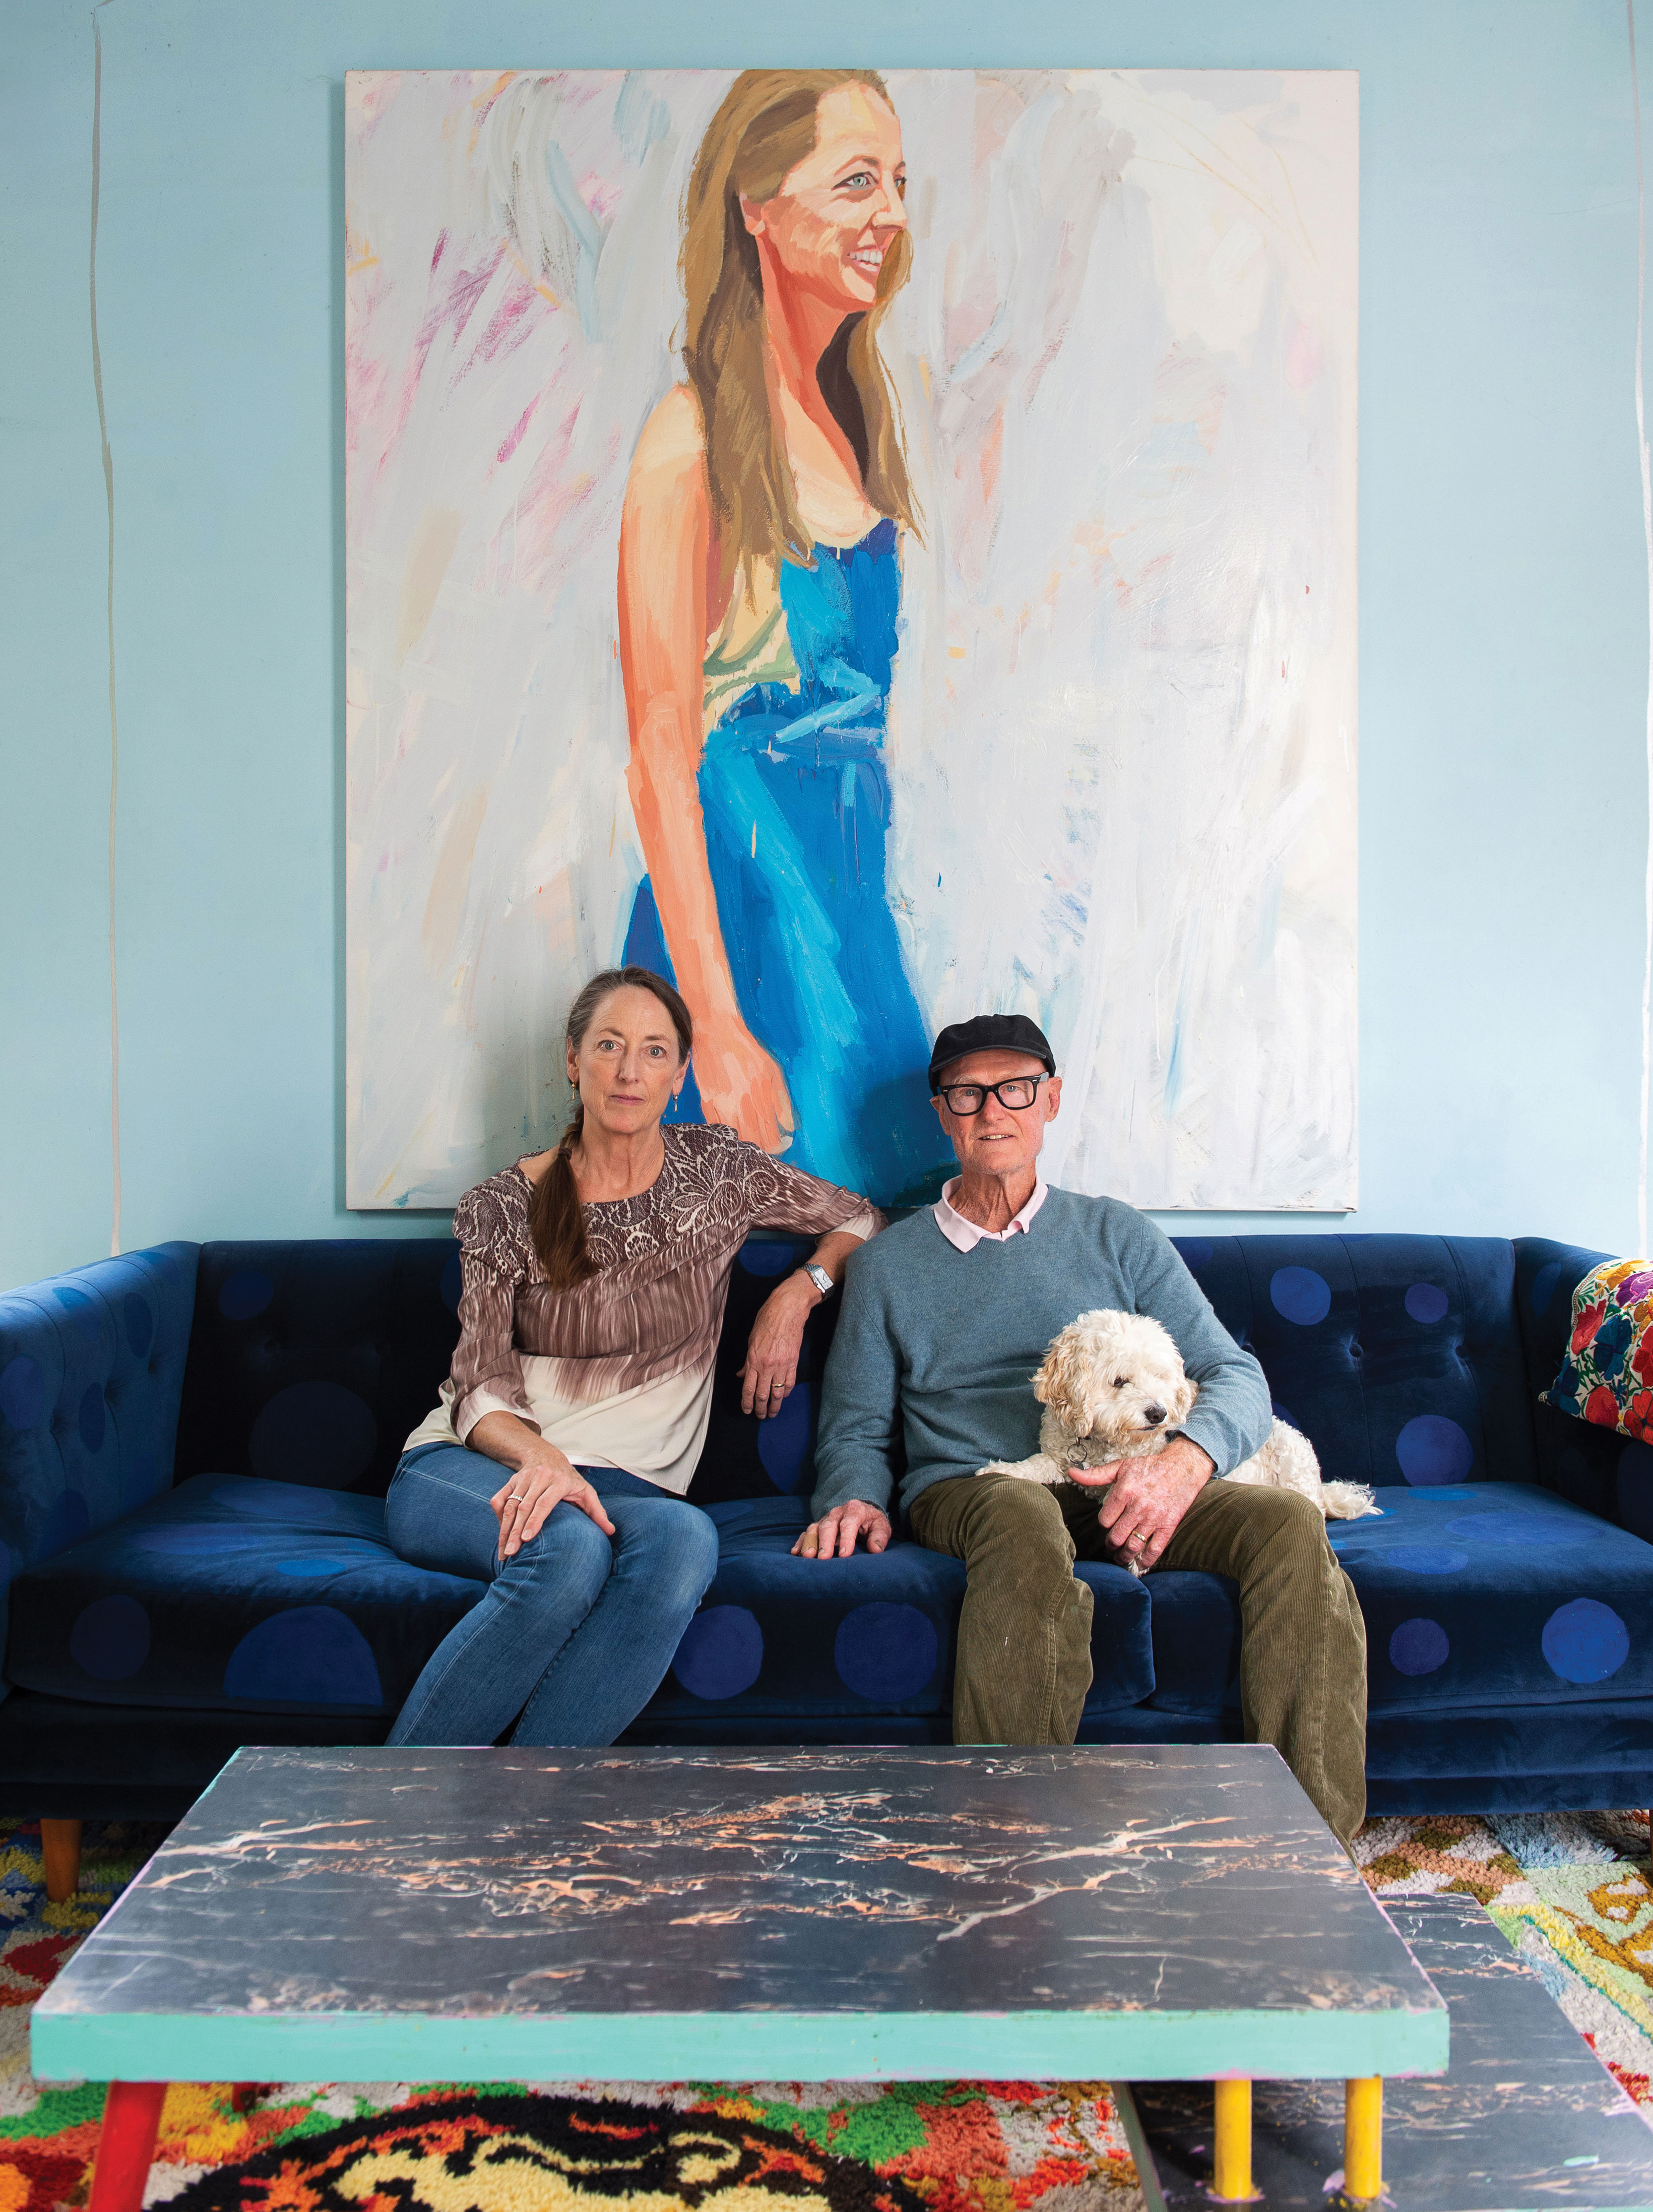 jean lowe and kim macconnel art home